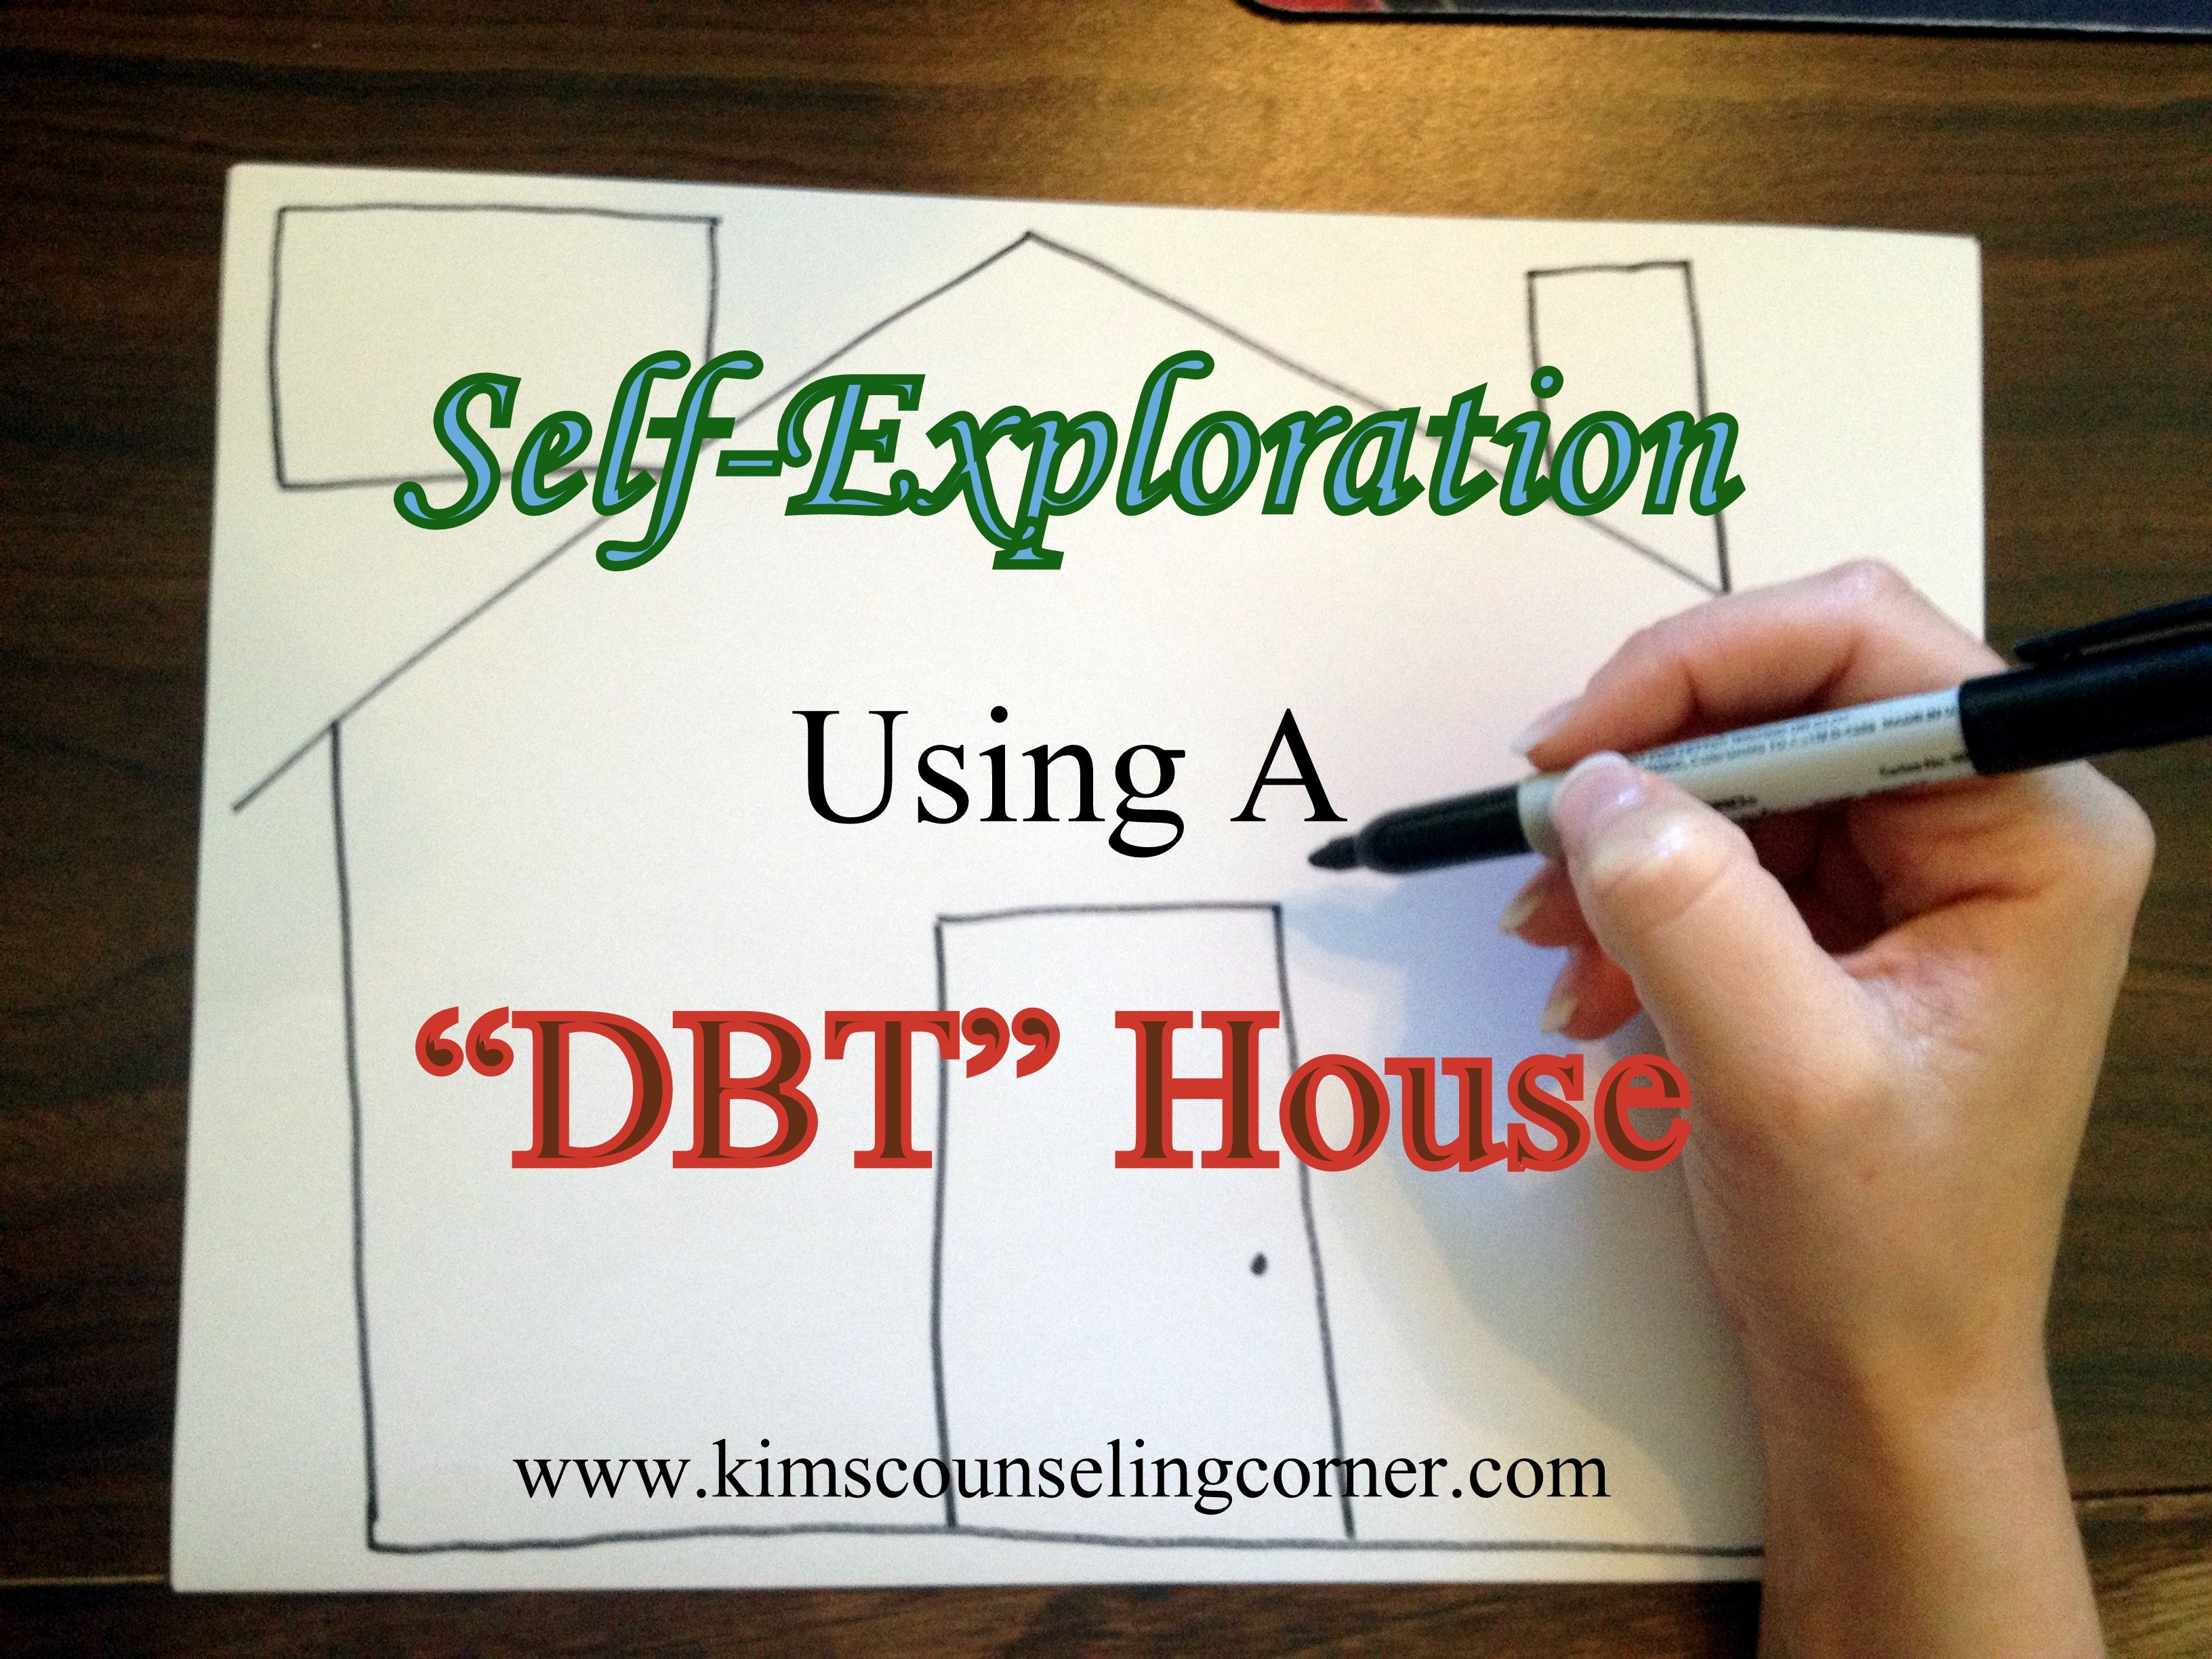 Self Exploration Using A Dbt House